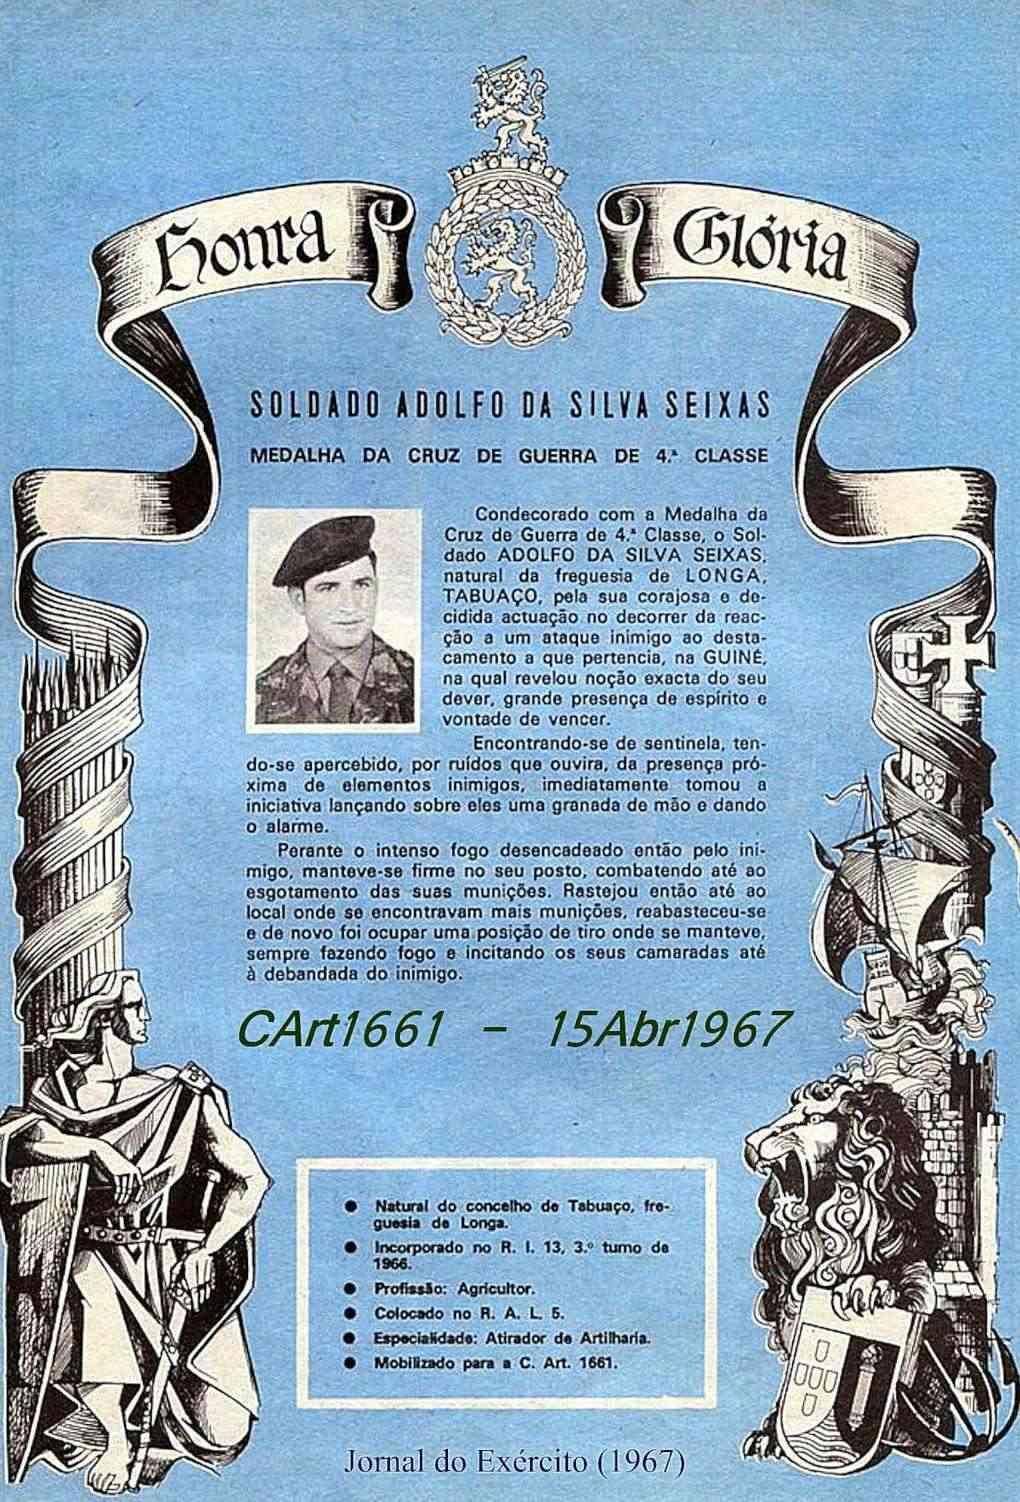 Adolfo da Silva Seixas, CArt1661/CTIG: Cruz de Guerra de 4.ª classe Cart1611